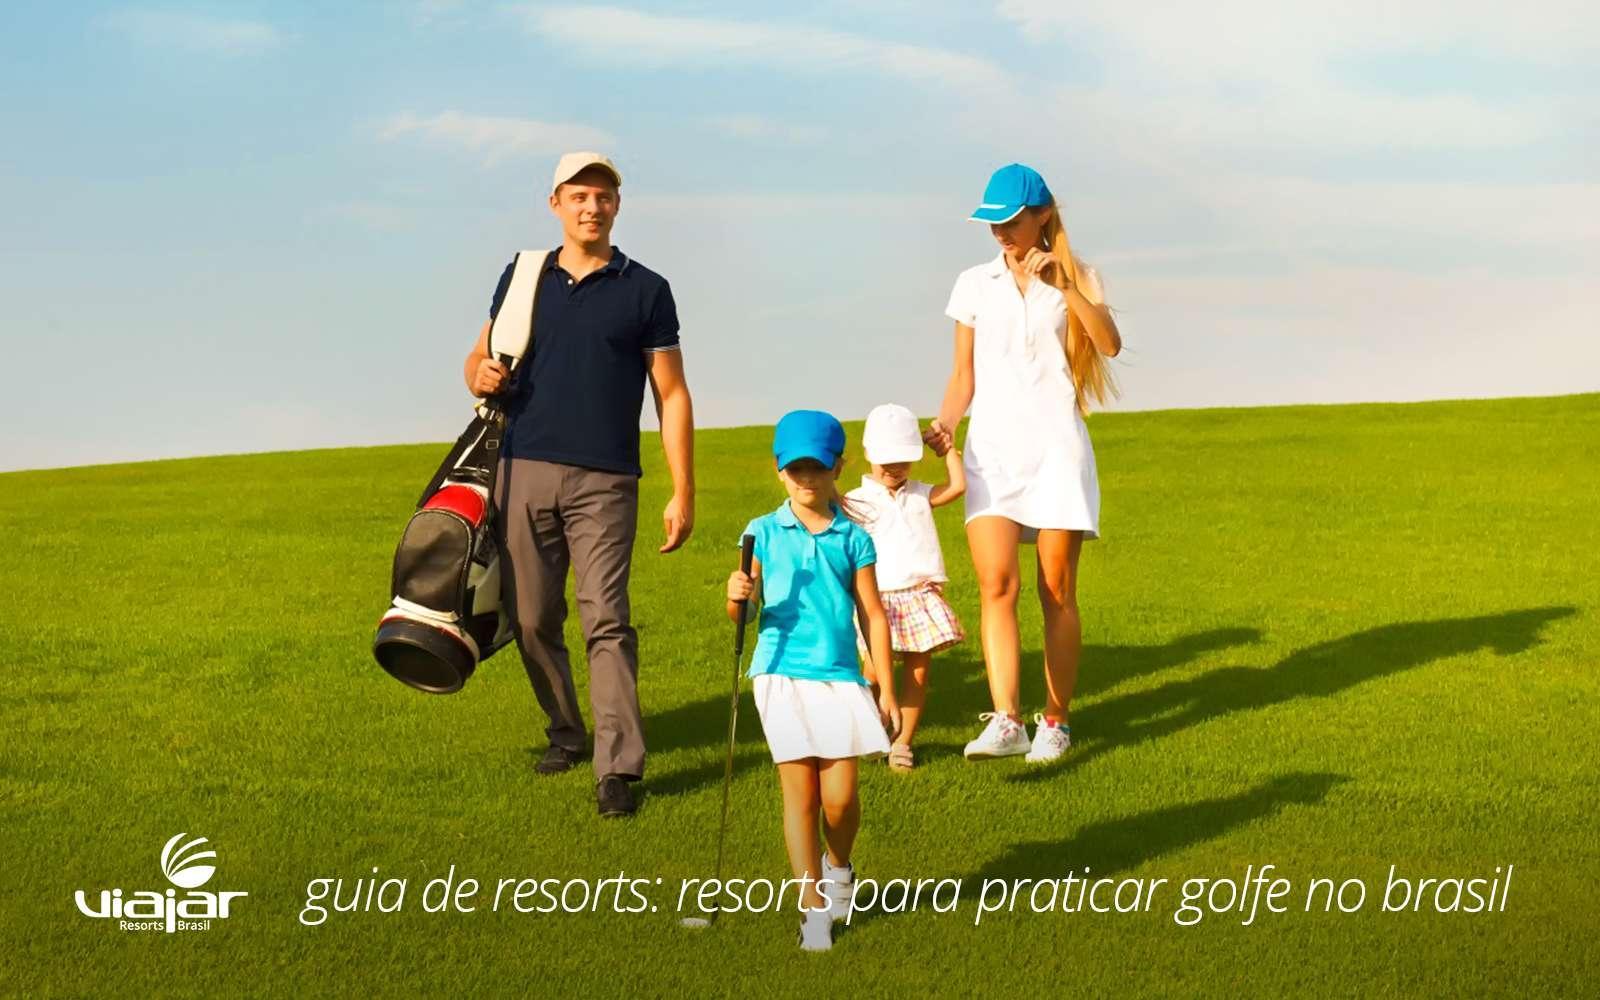 8 melhores resorts para praticar golfe no Brasil   Viajar Resorts 9aa0da1c3b